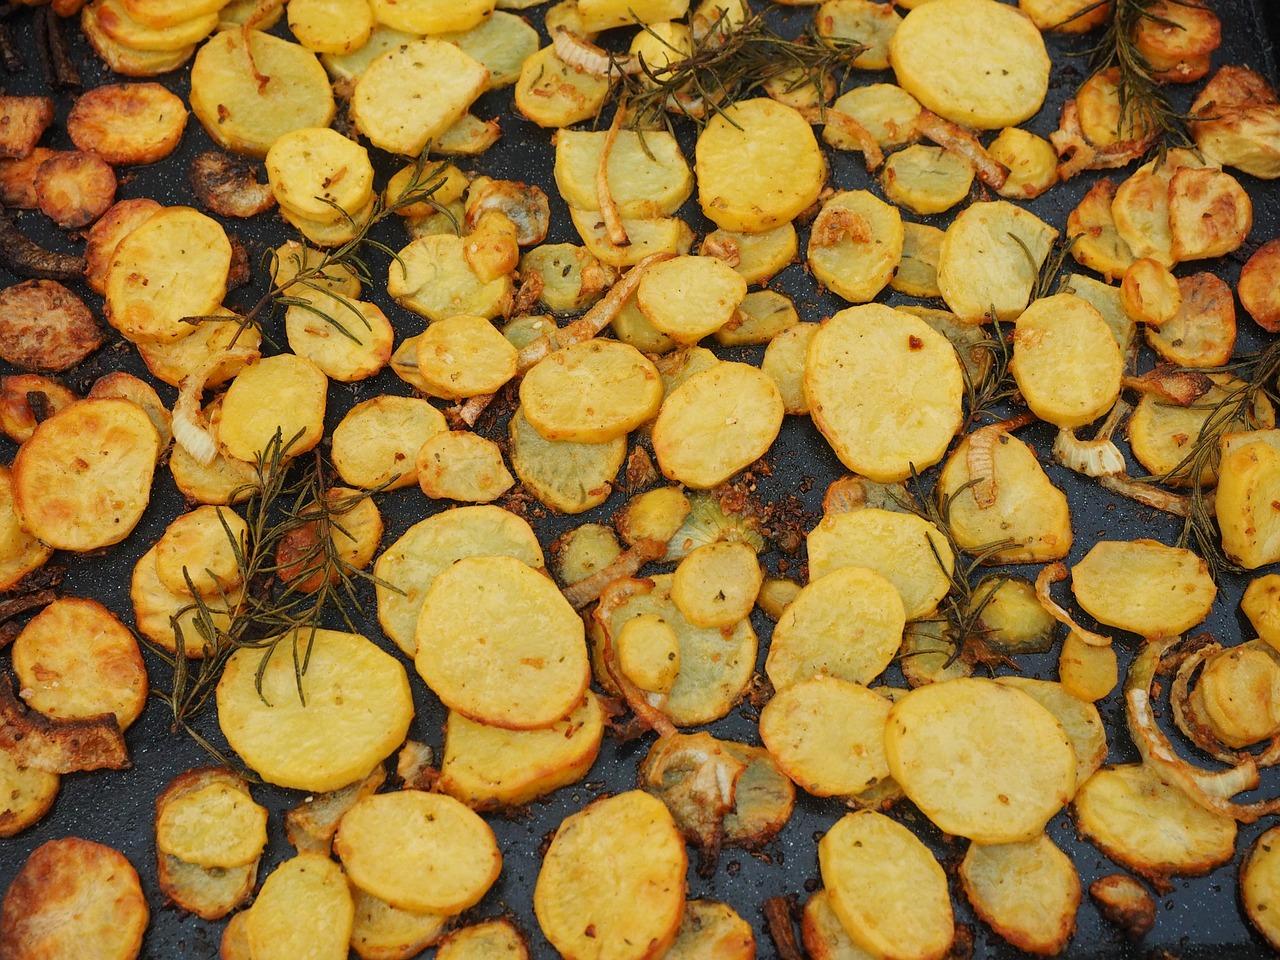 potatoes-609661_1280.jpg